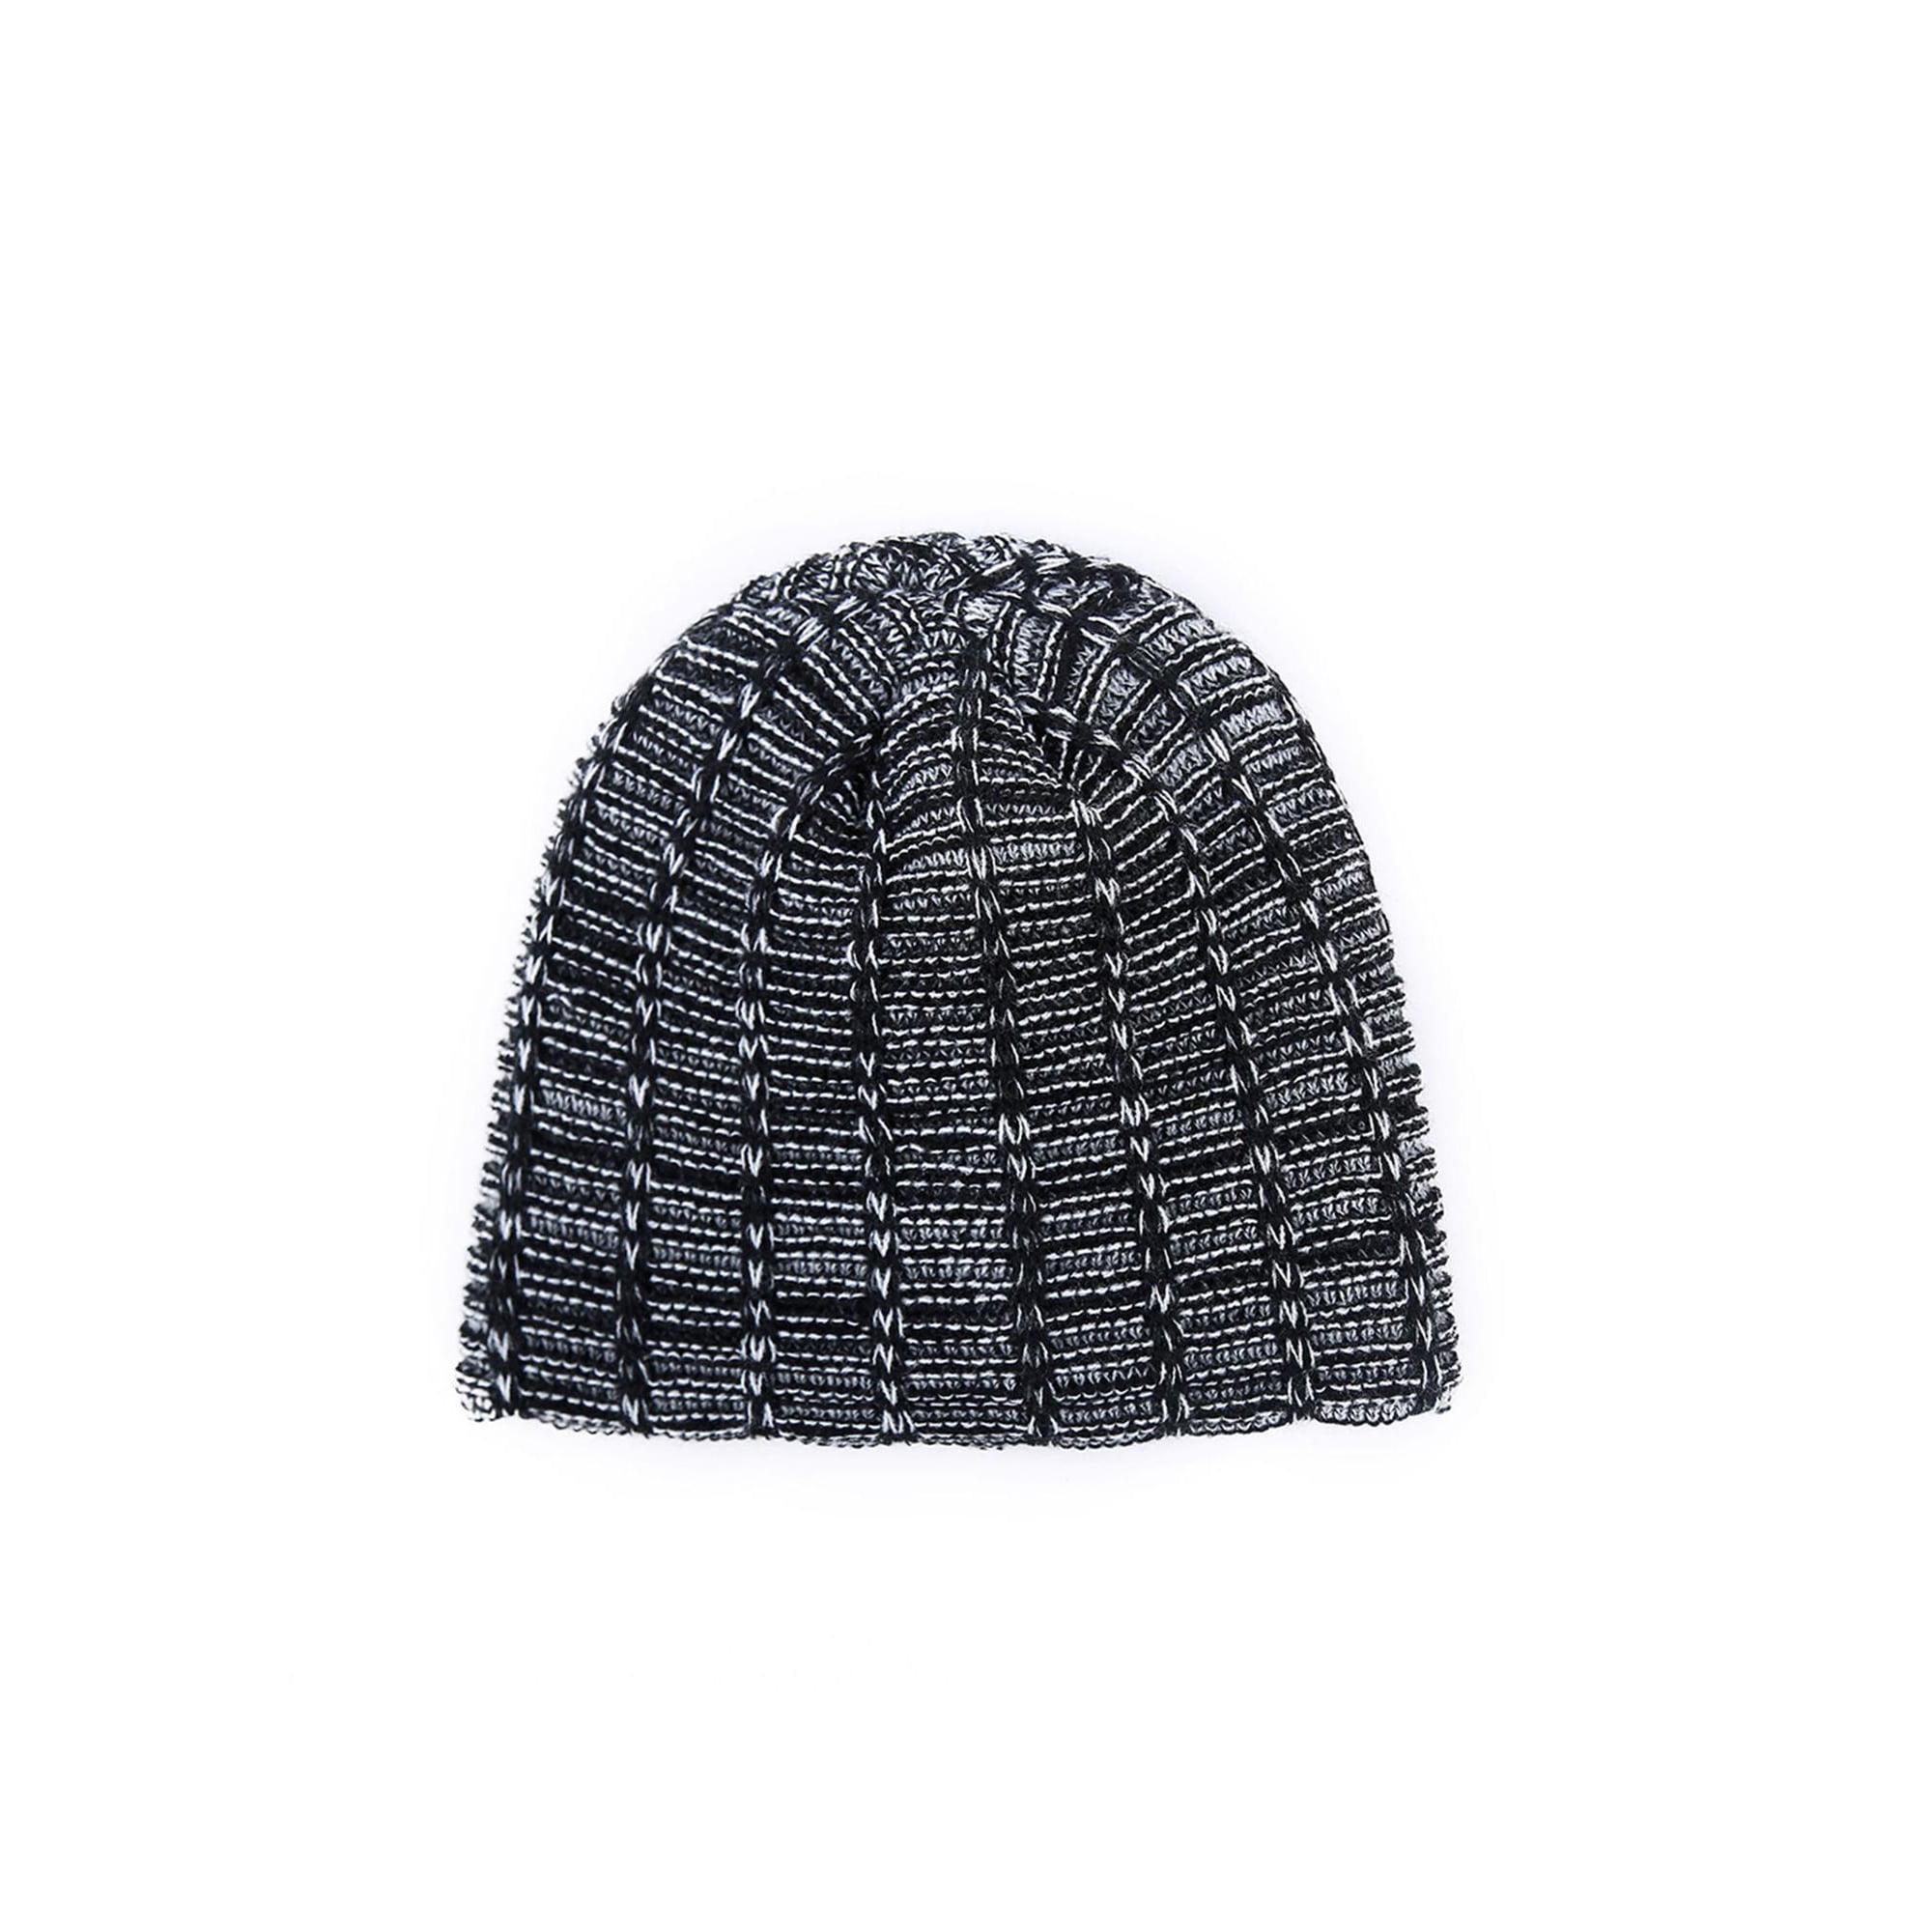 fdbfaea58 CAroojer Women Men Hat Casual Winter Warm Beanie Cap Skiing Knitted Hat  Caroj